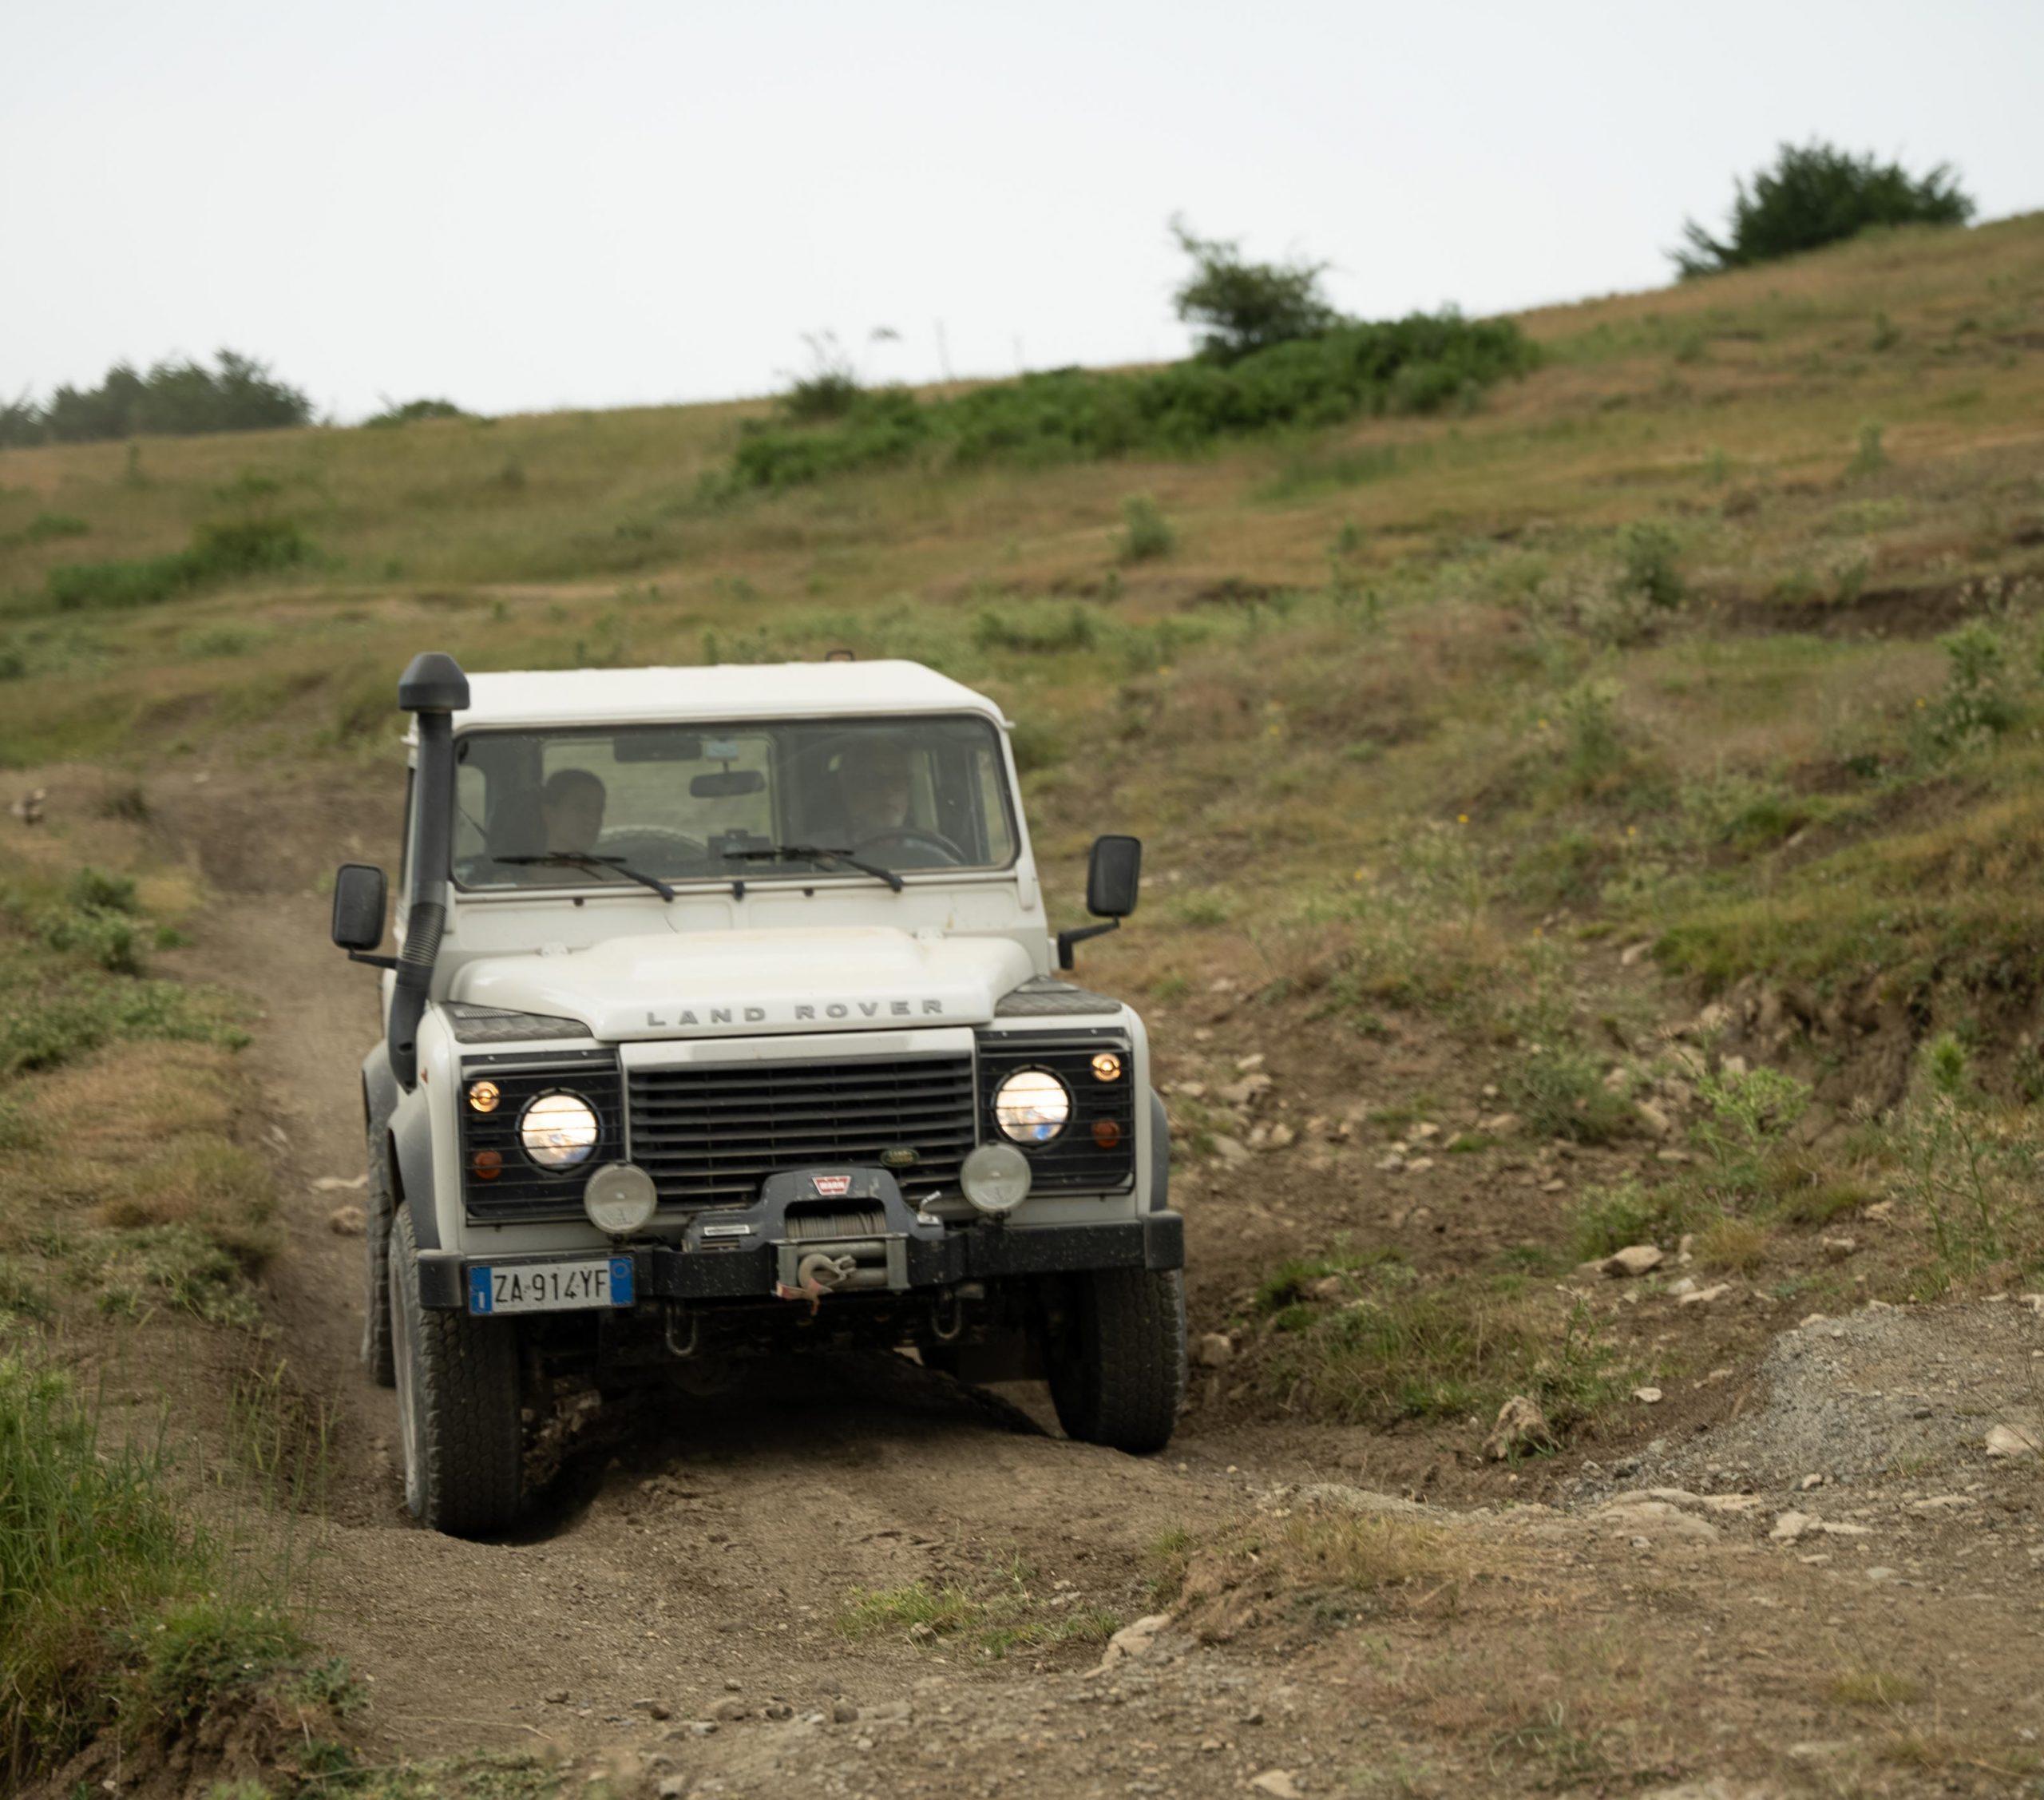 Land_Rover_Tour_Sicilia_2021_Land_Rover_Experience_Italia_-71